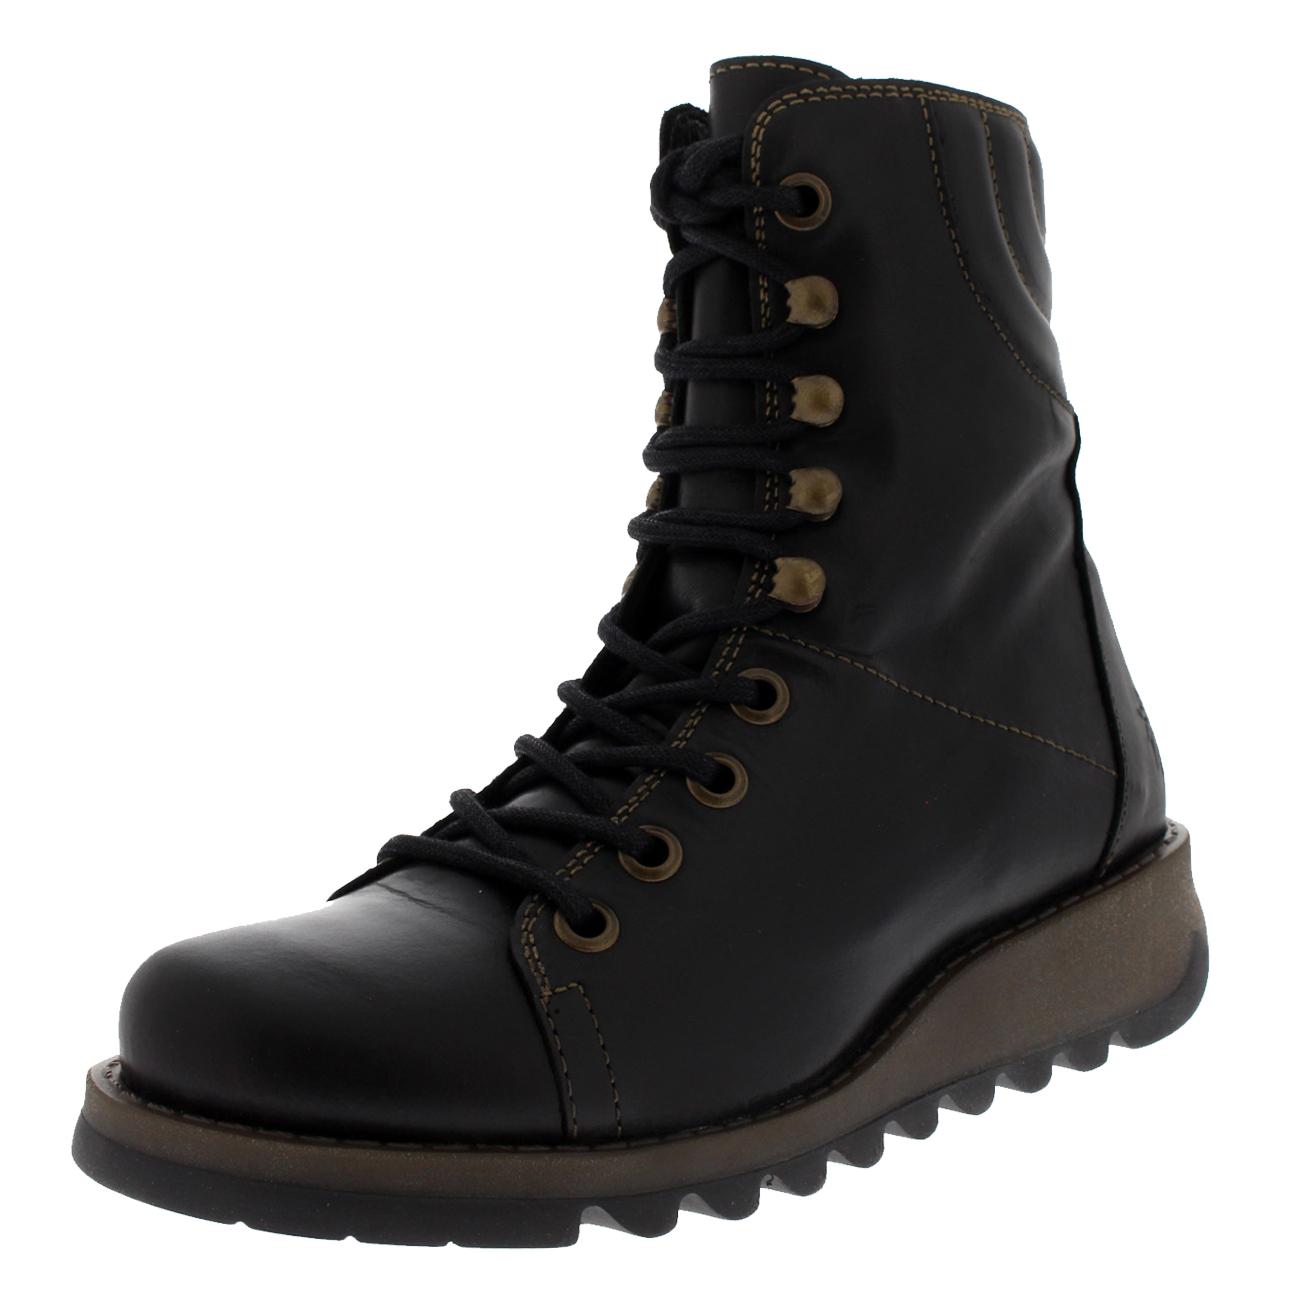 Ladies Fly London Same Rug Biker Low Heel Winter Fashion Bnkle Boots Bll Sizes